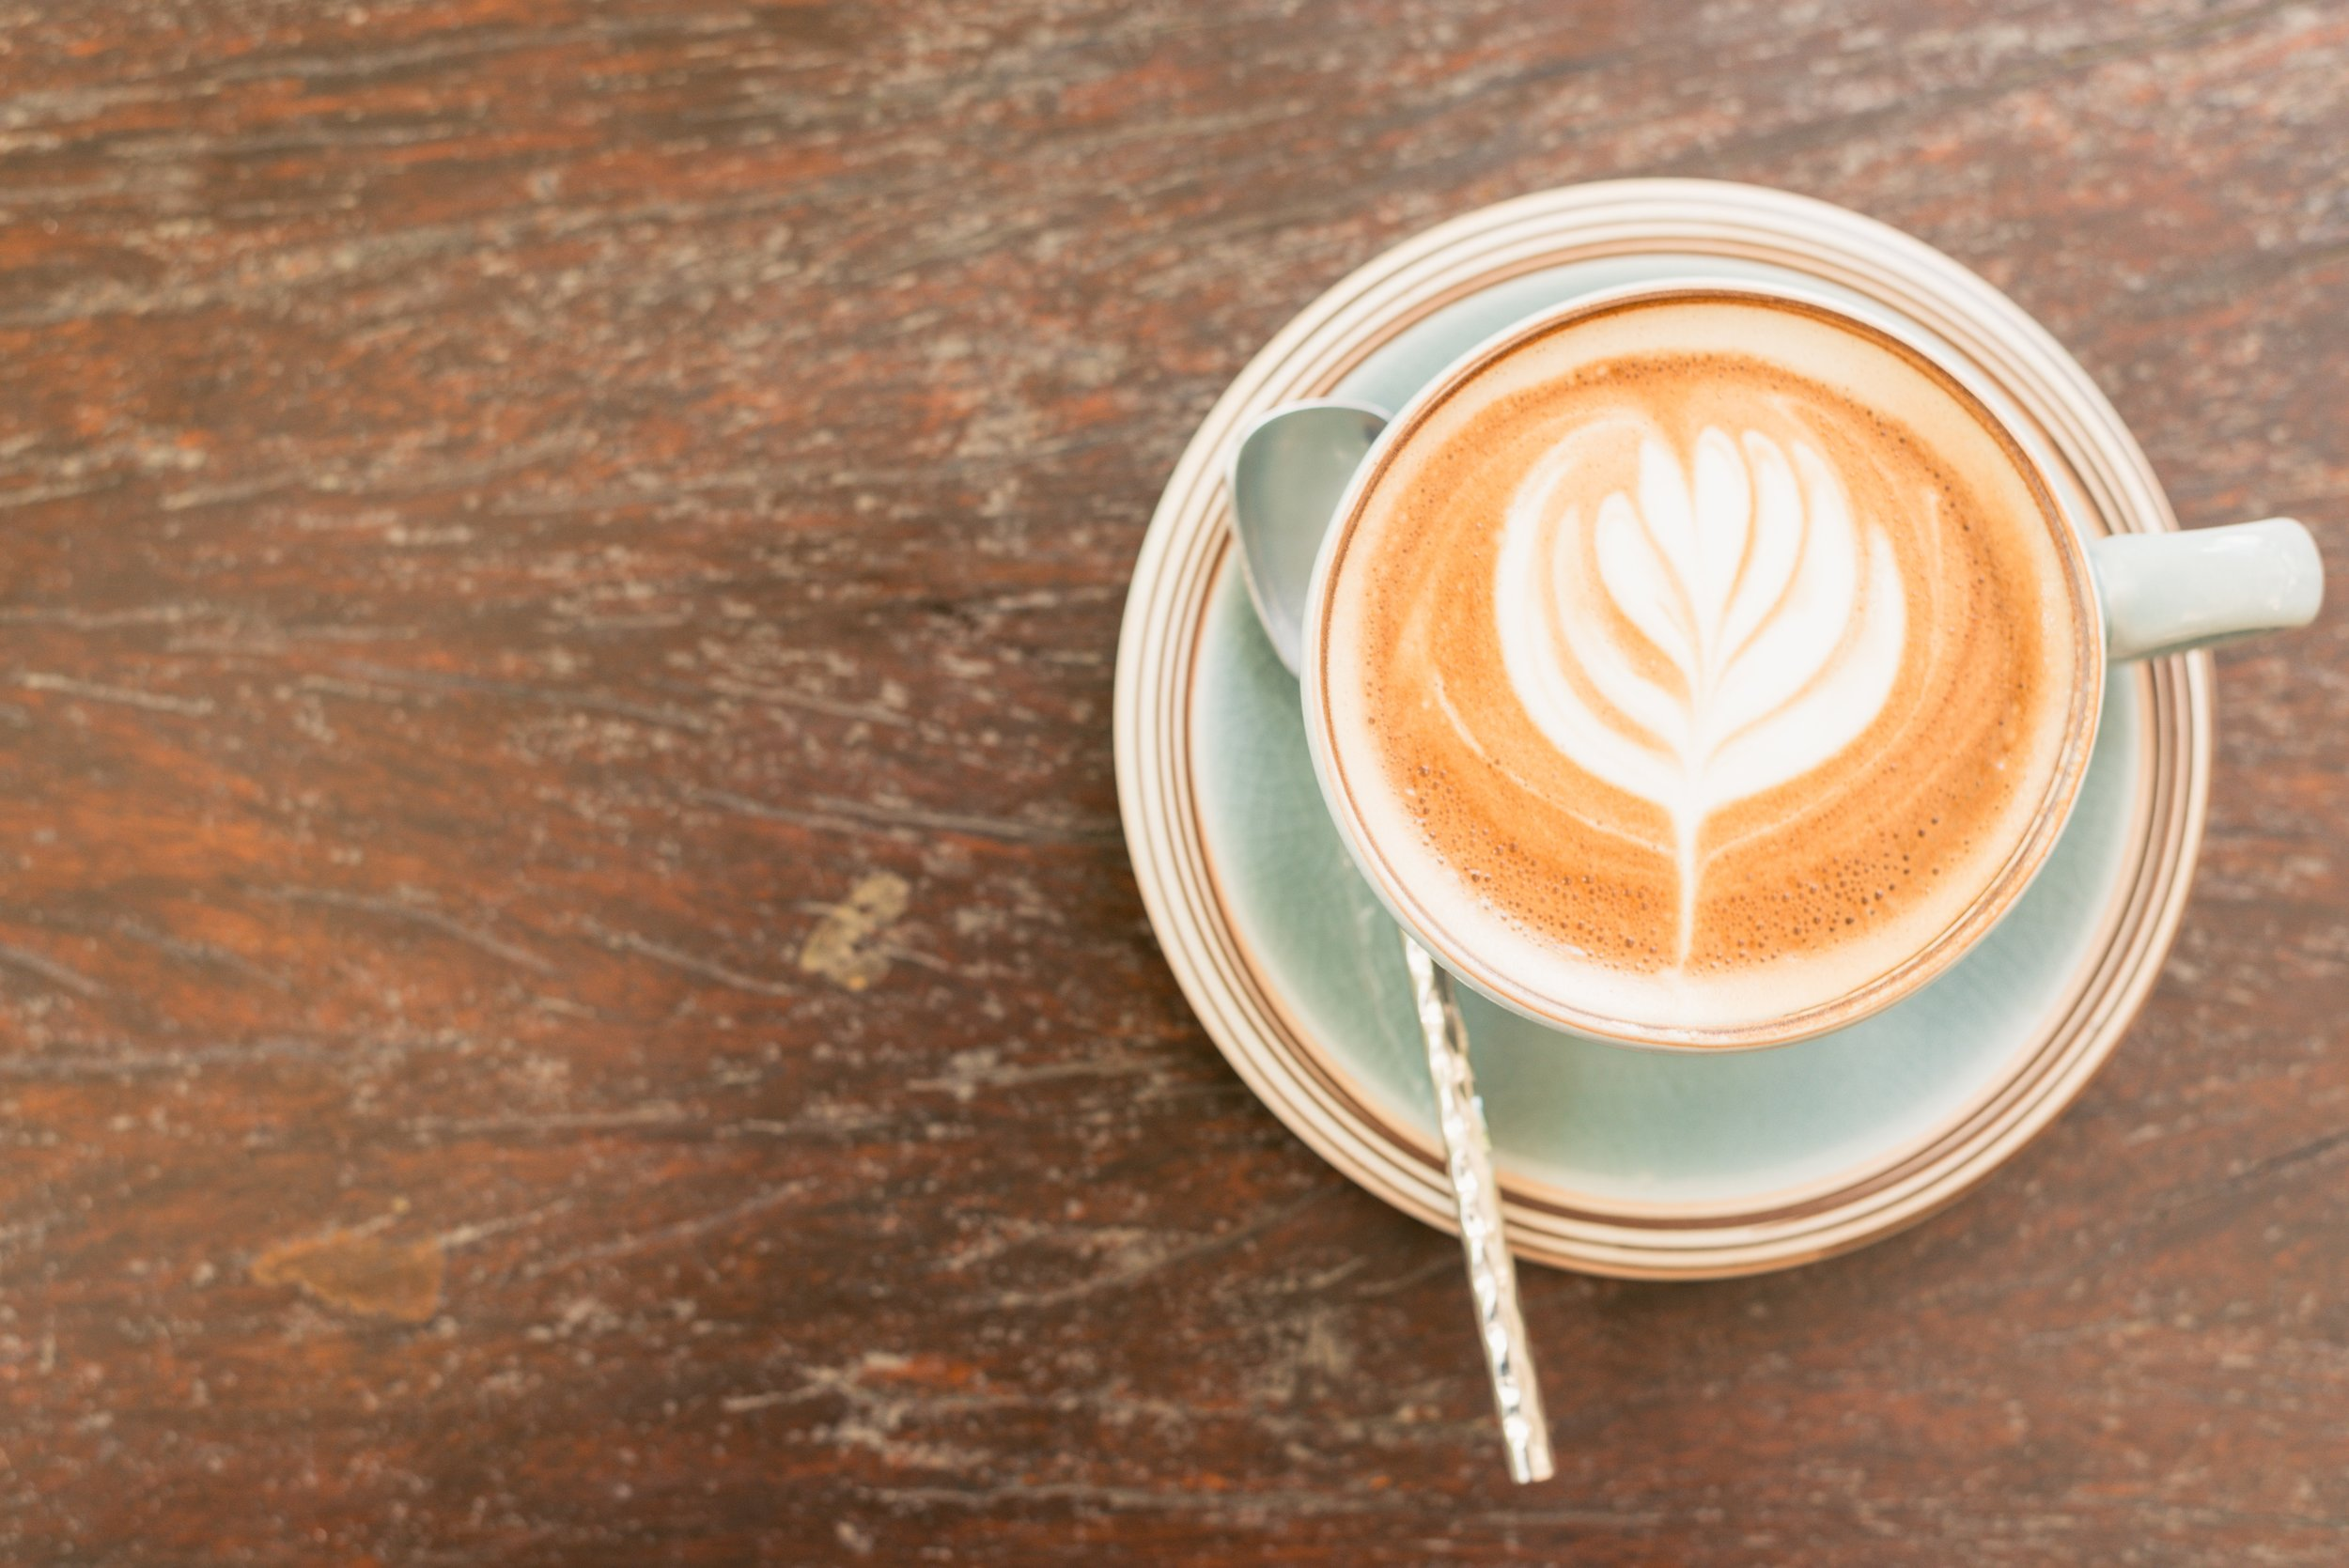 10 Coffee Shops You'll Love